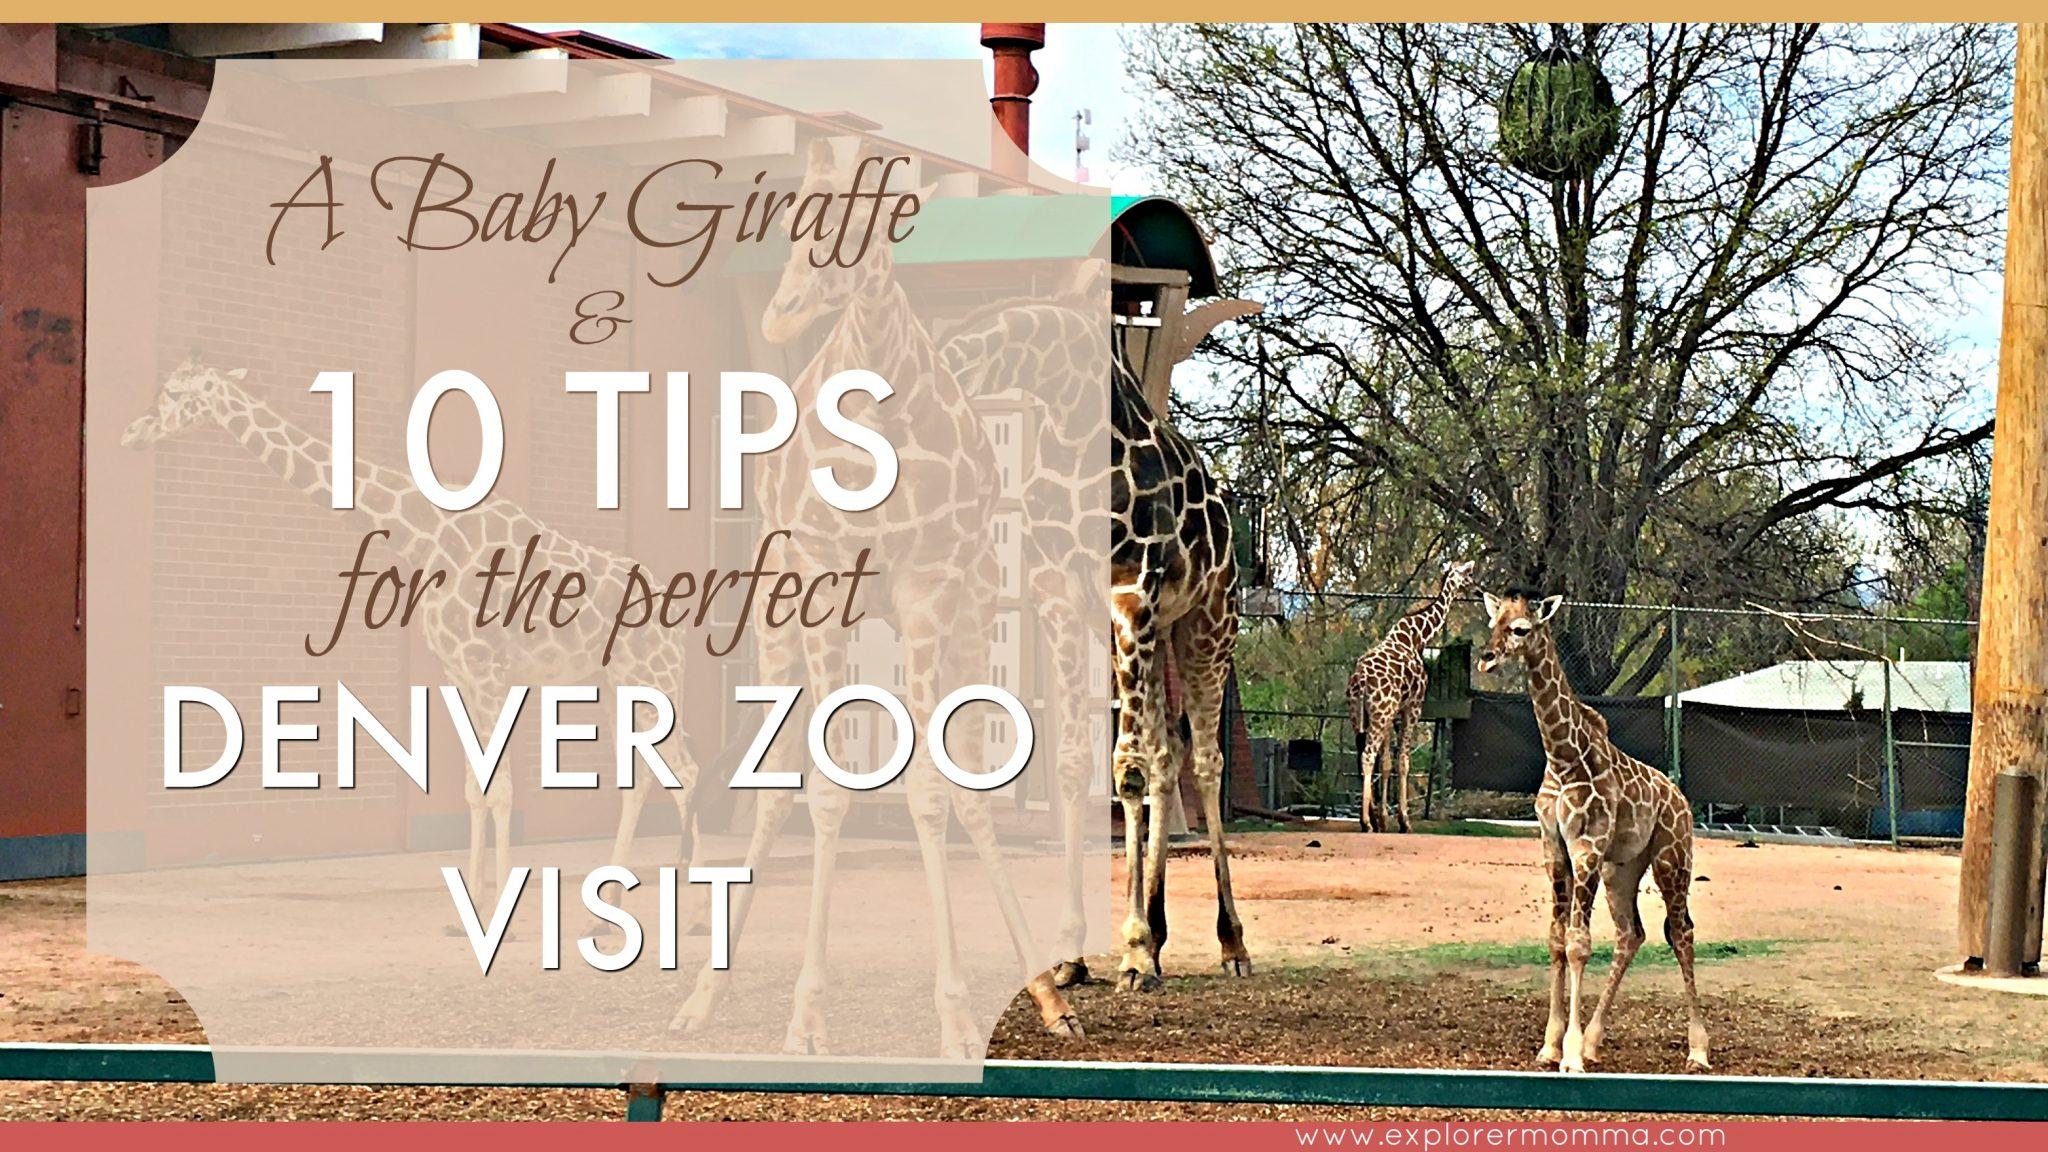 Baby Giraffe at the Denver Zoo